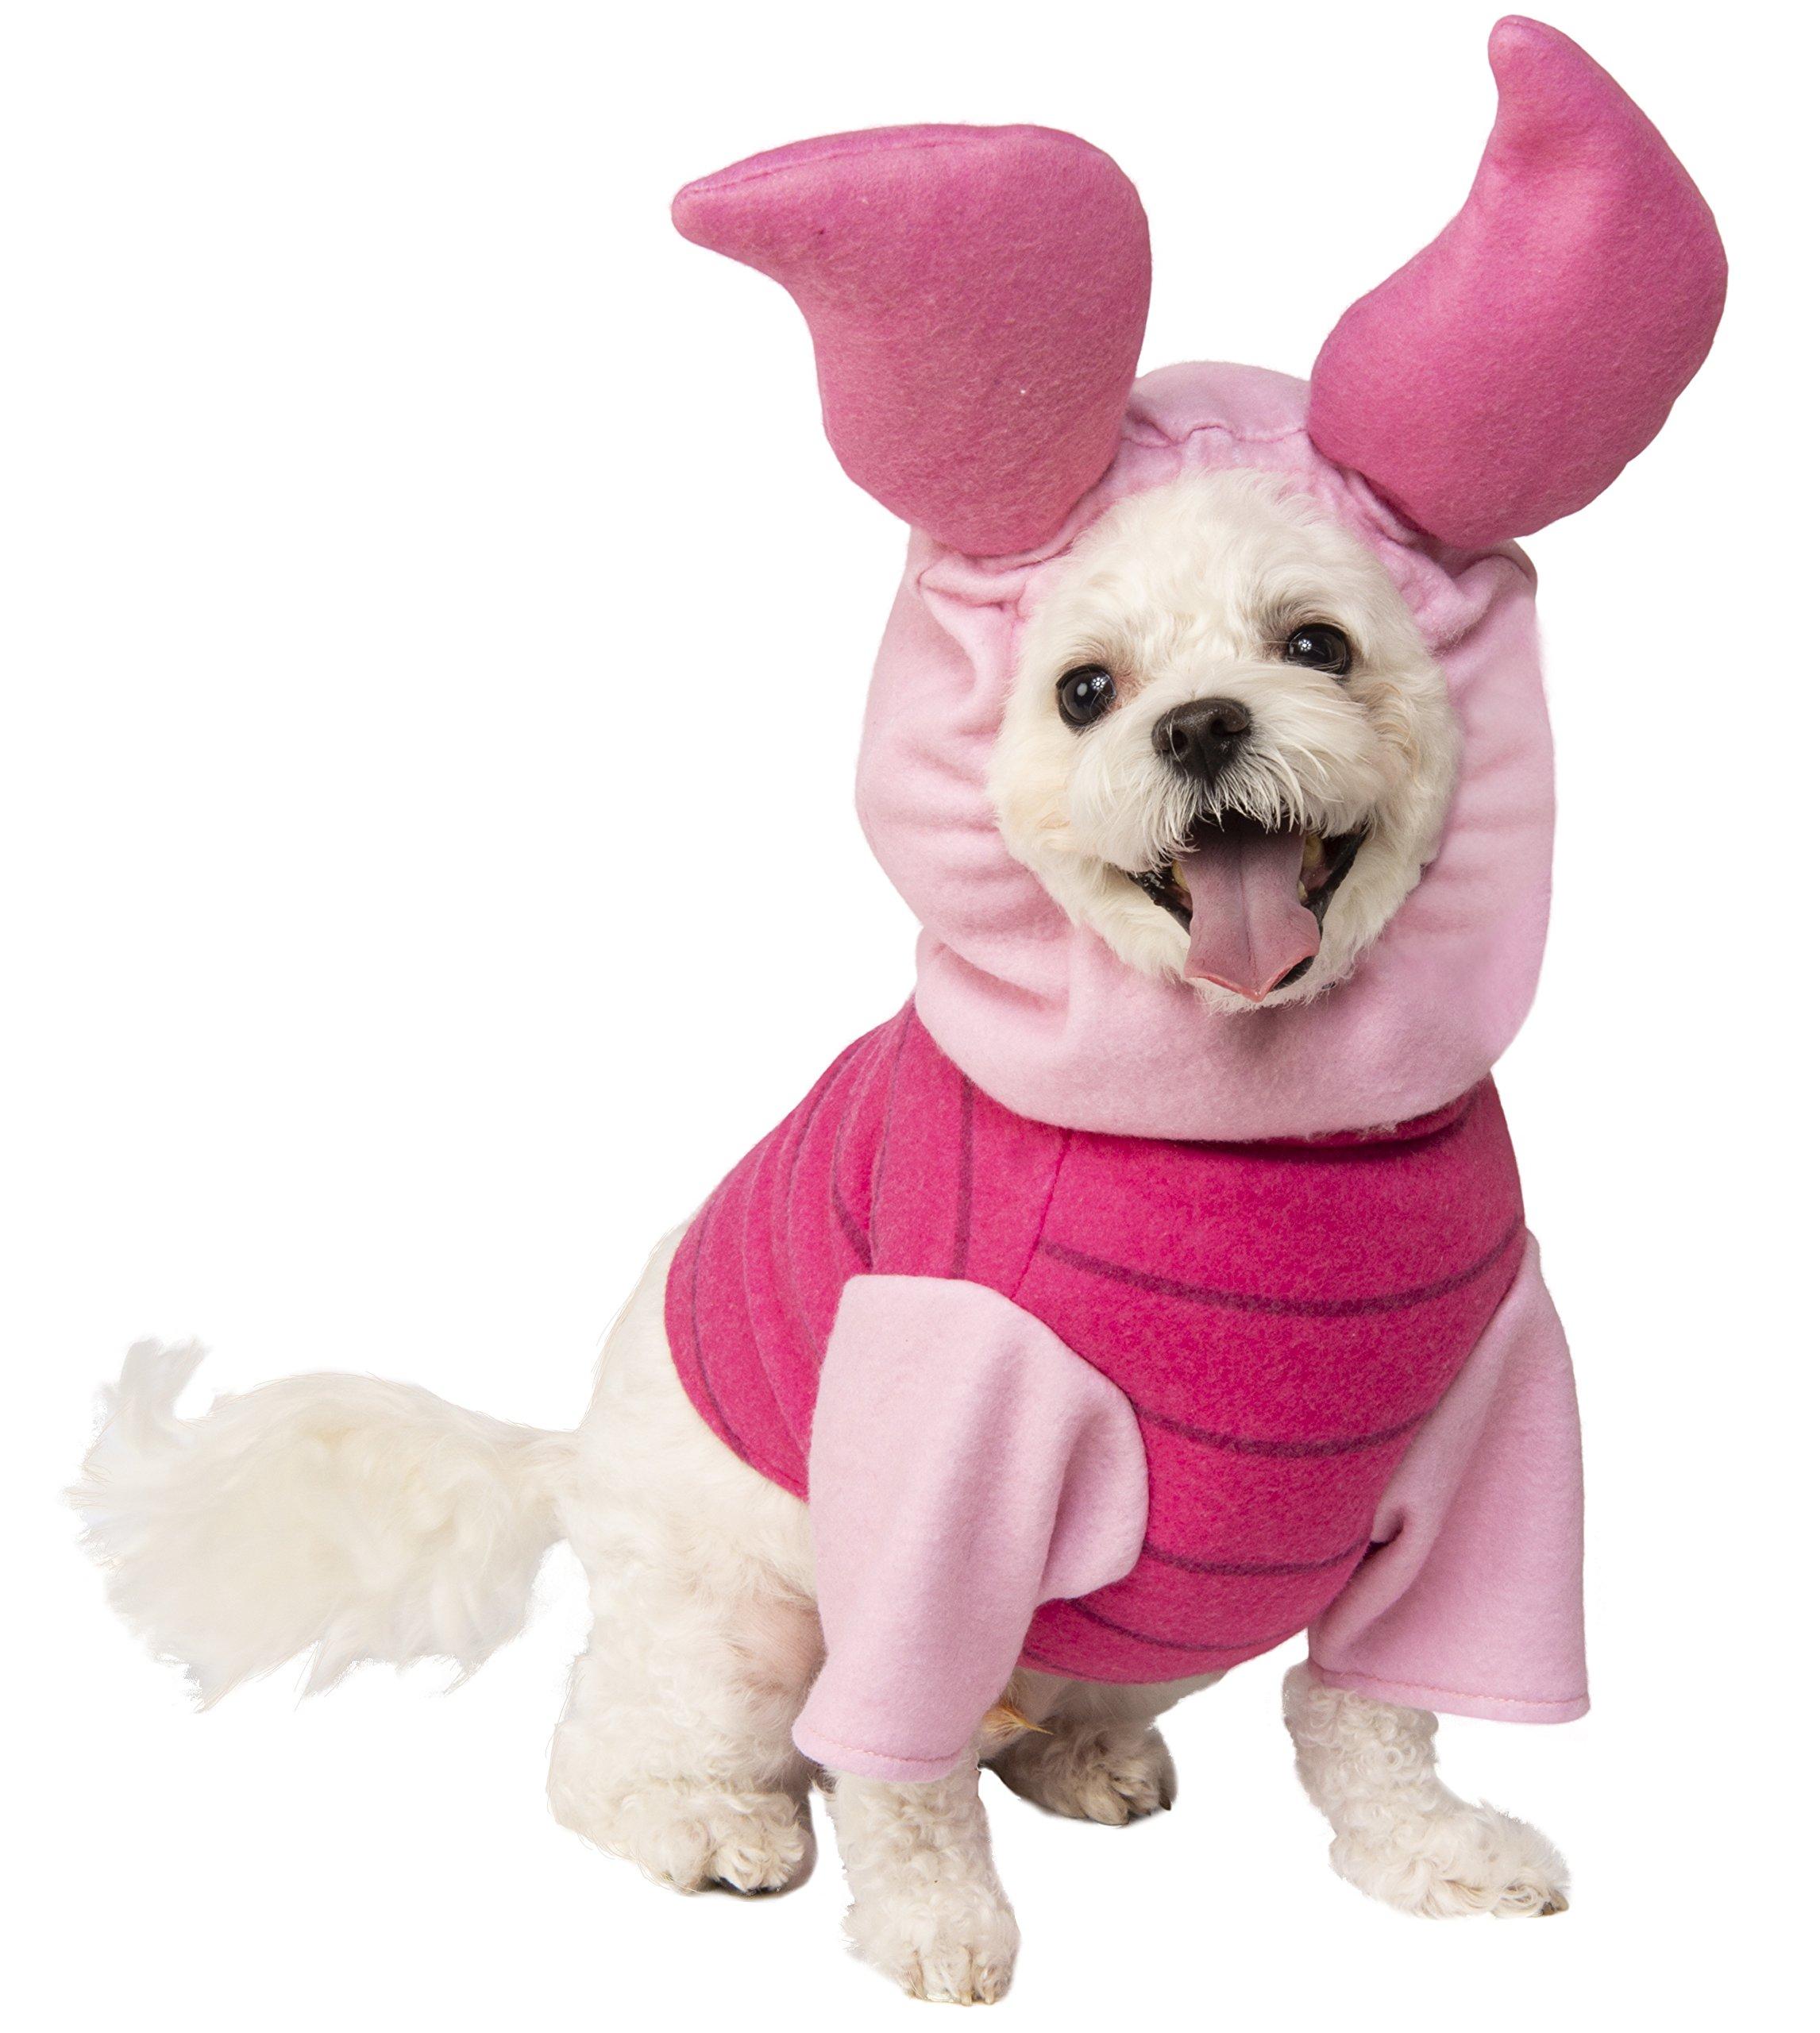 Rubie's Disney: Winnie The Pooh Pet Costume, Piglet, Medium